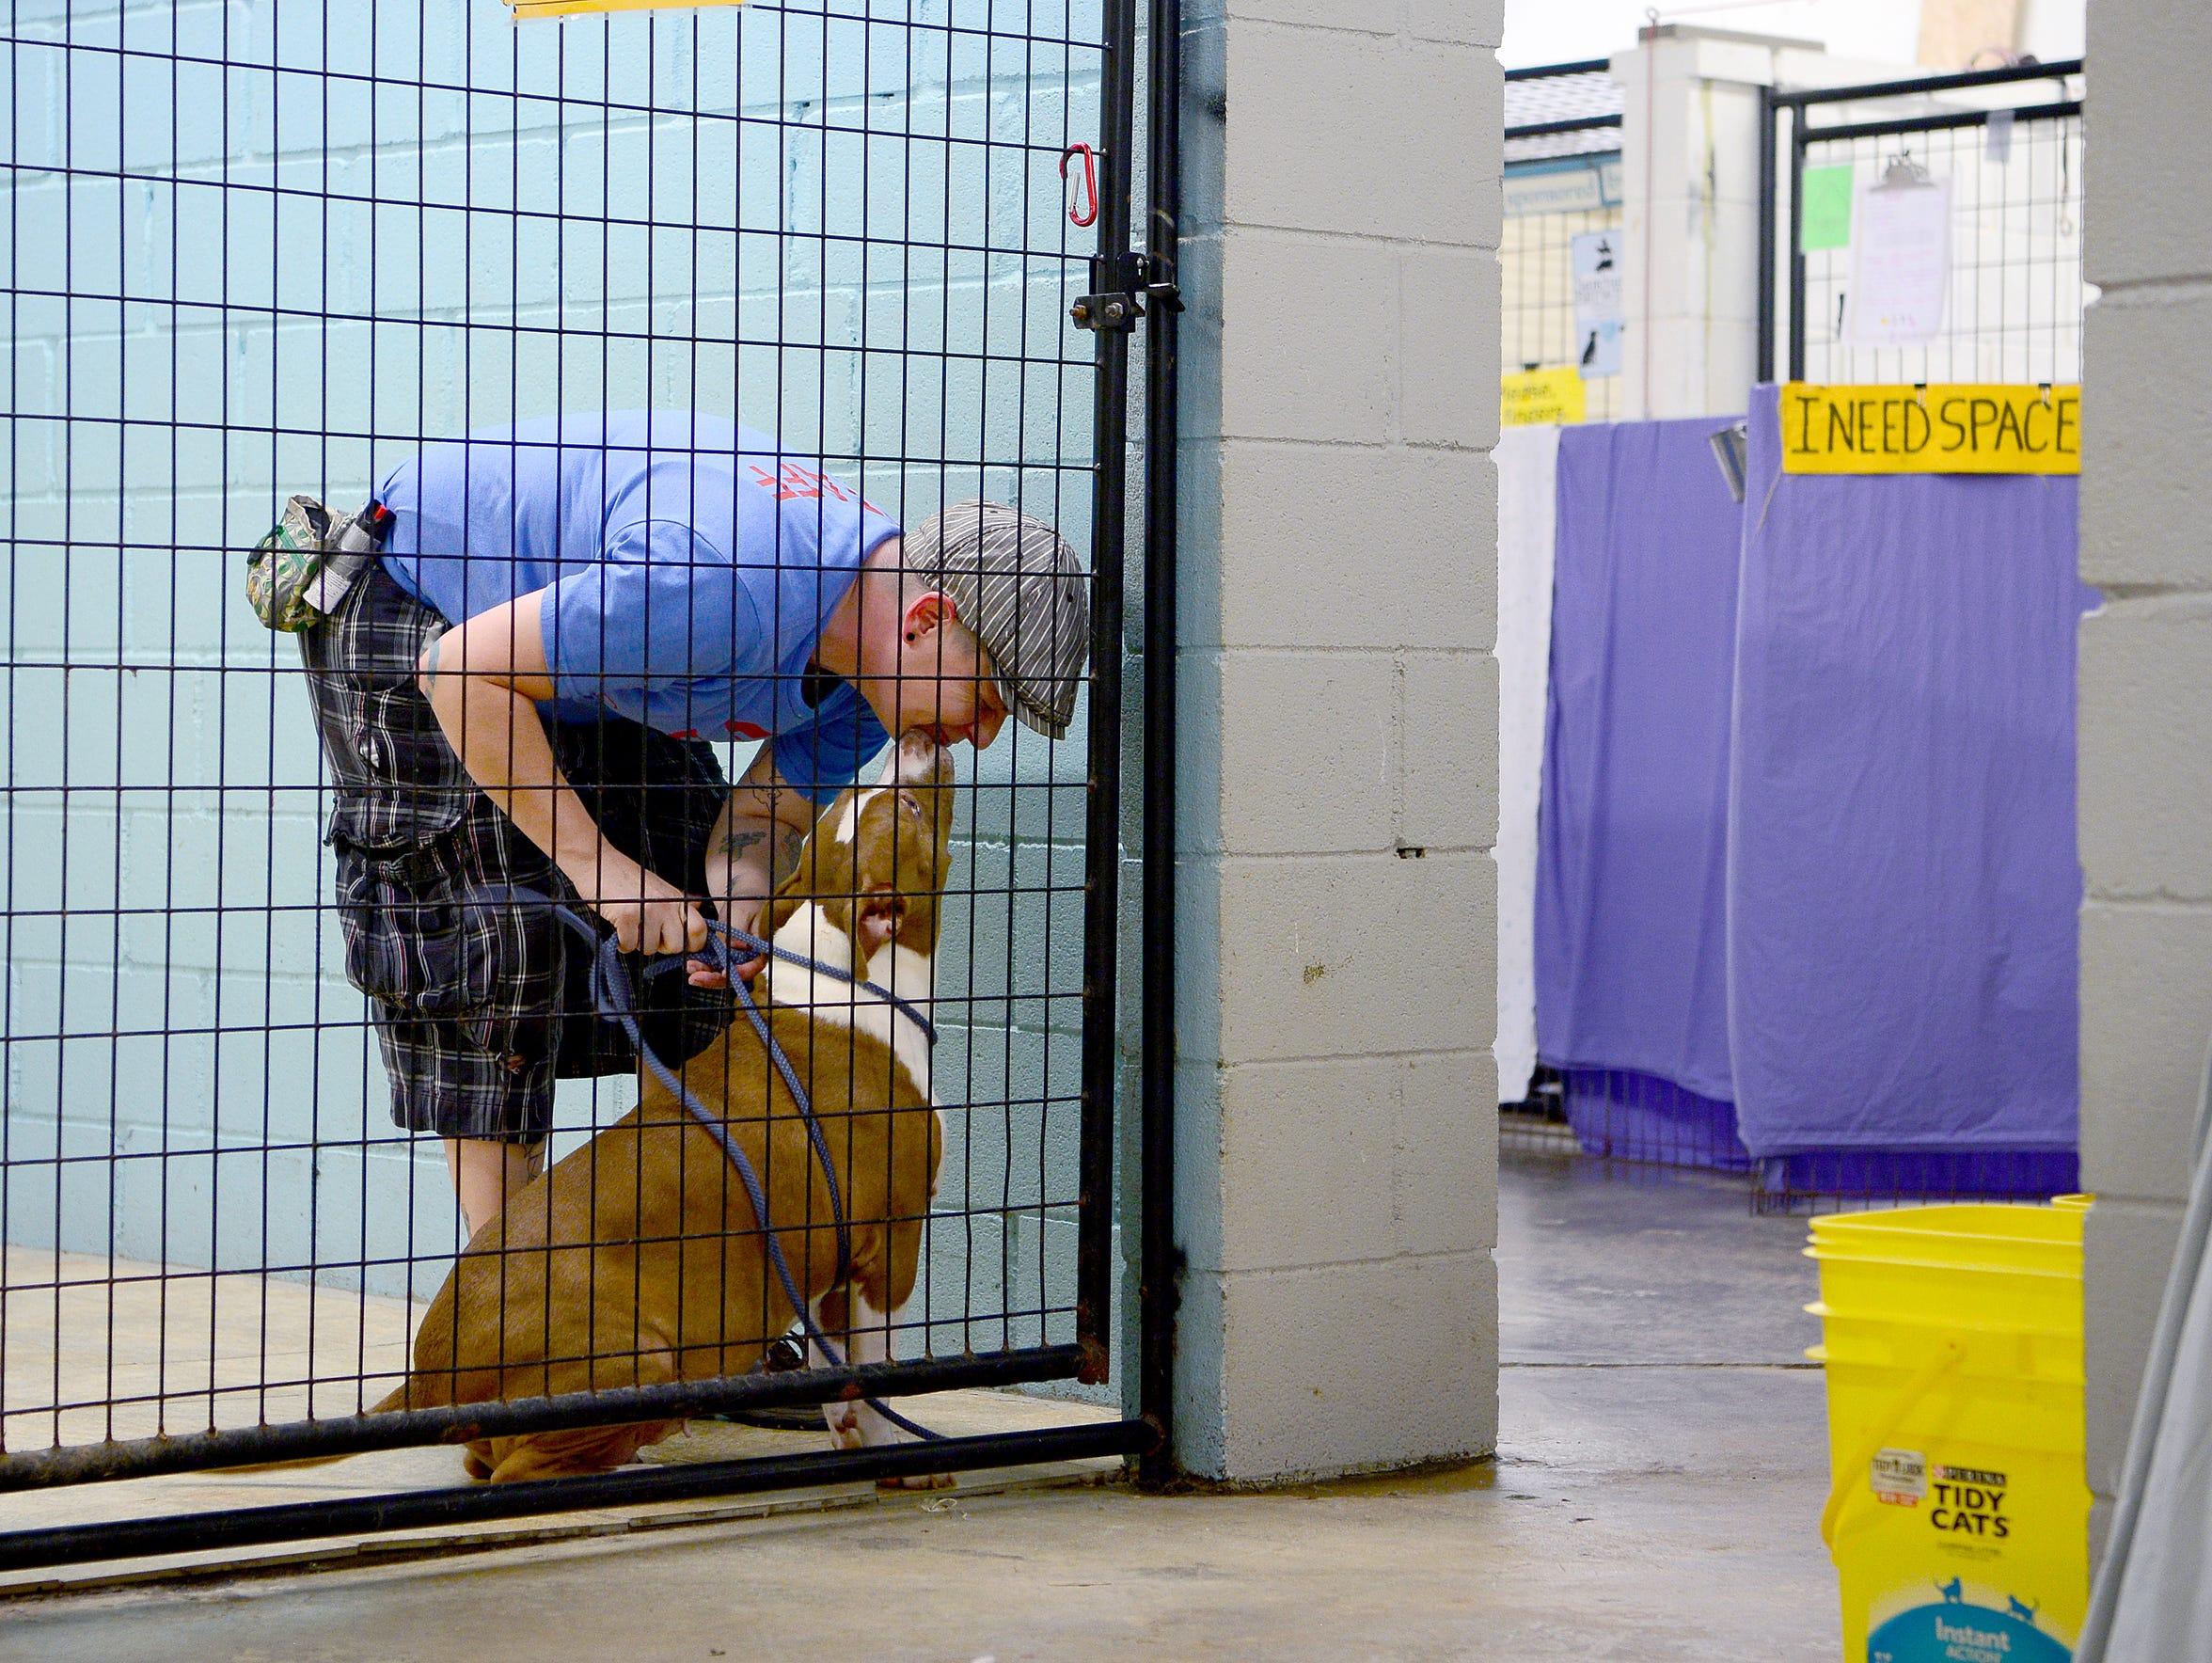 Brother Wolf Animal Rescue staff member Hannah Edgar